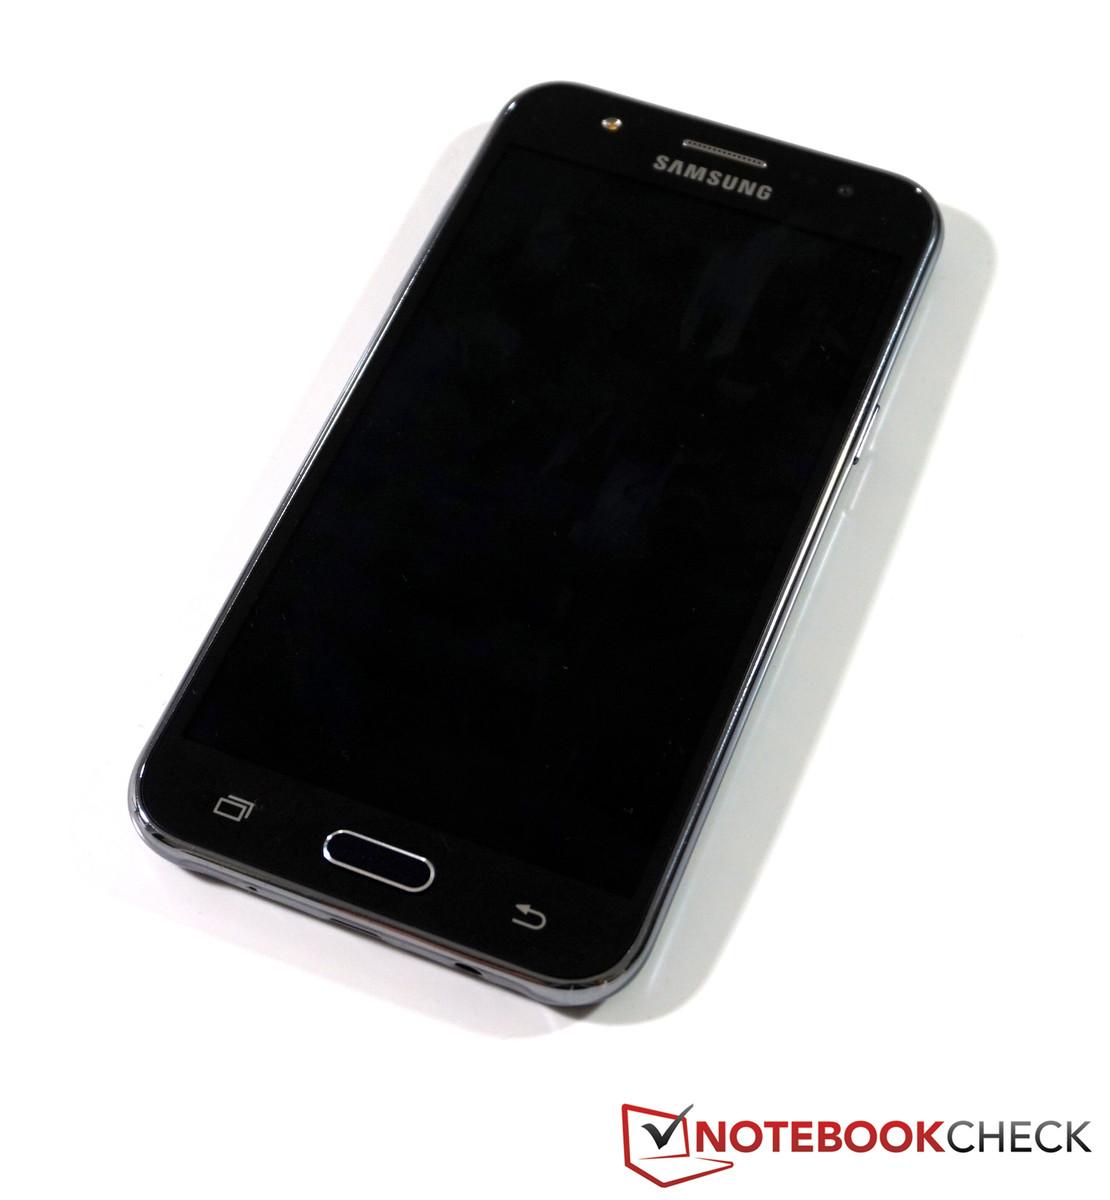 Samsung Galaxy J5 Smartphone Review - NotebookCheck.net Reviews